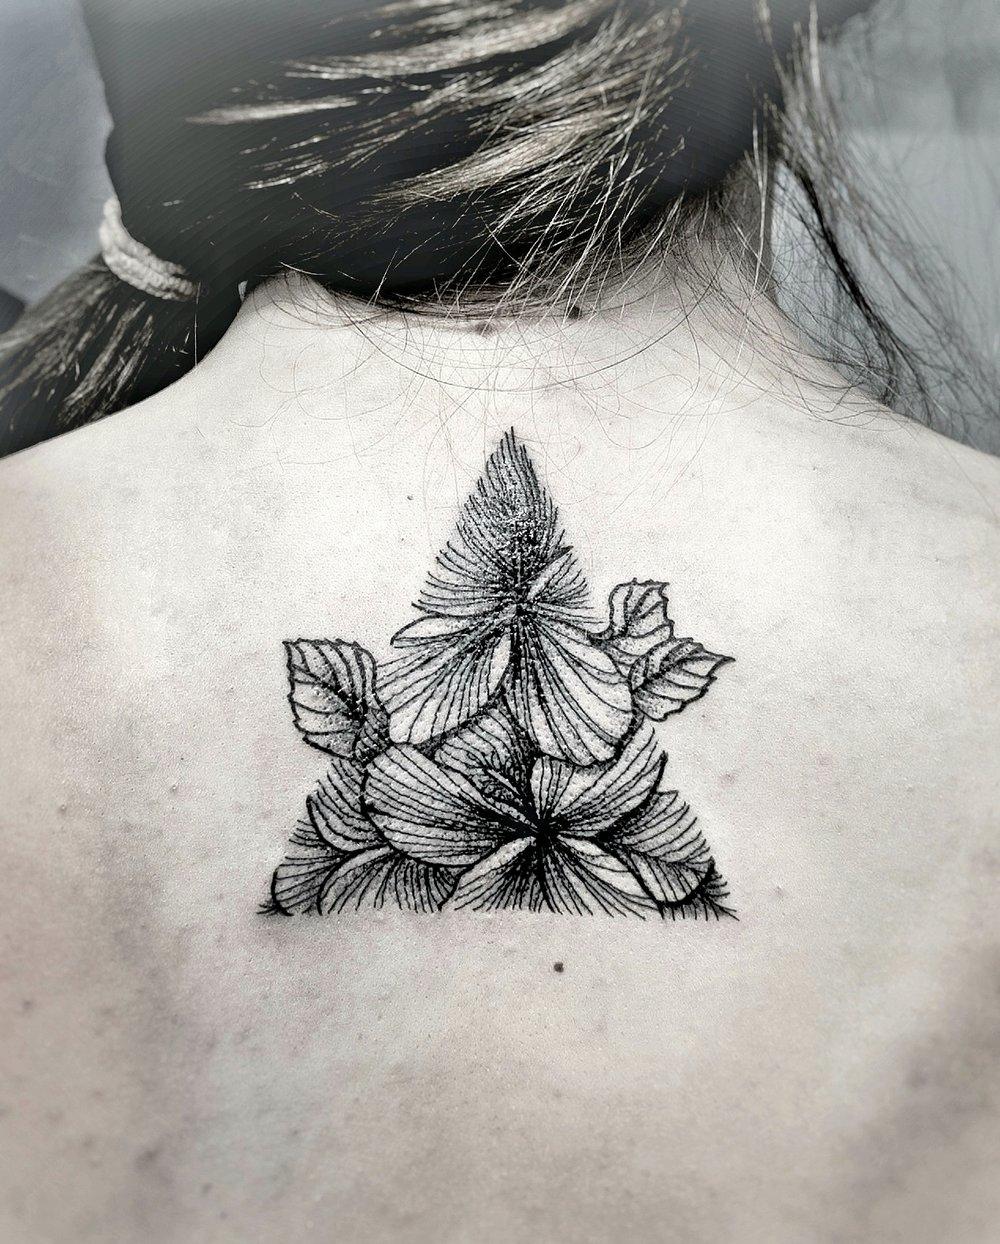 Custom Black Work Hibiscus Flowers inside a Trianlge Tattoo by Dani at Certified Tattoo Studios Denver Co.jpg